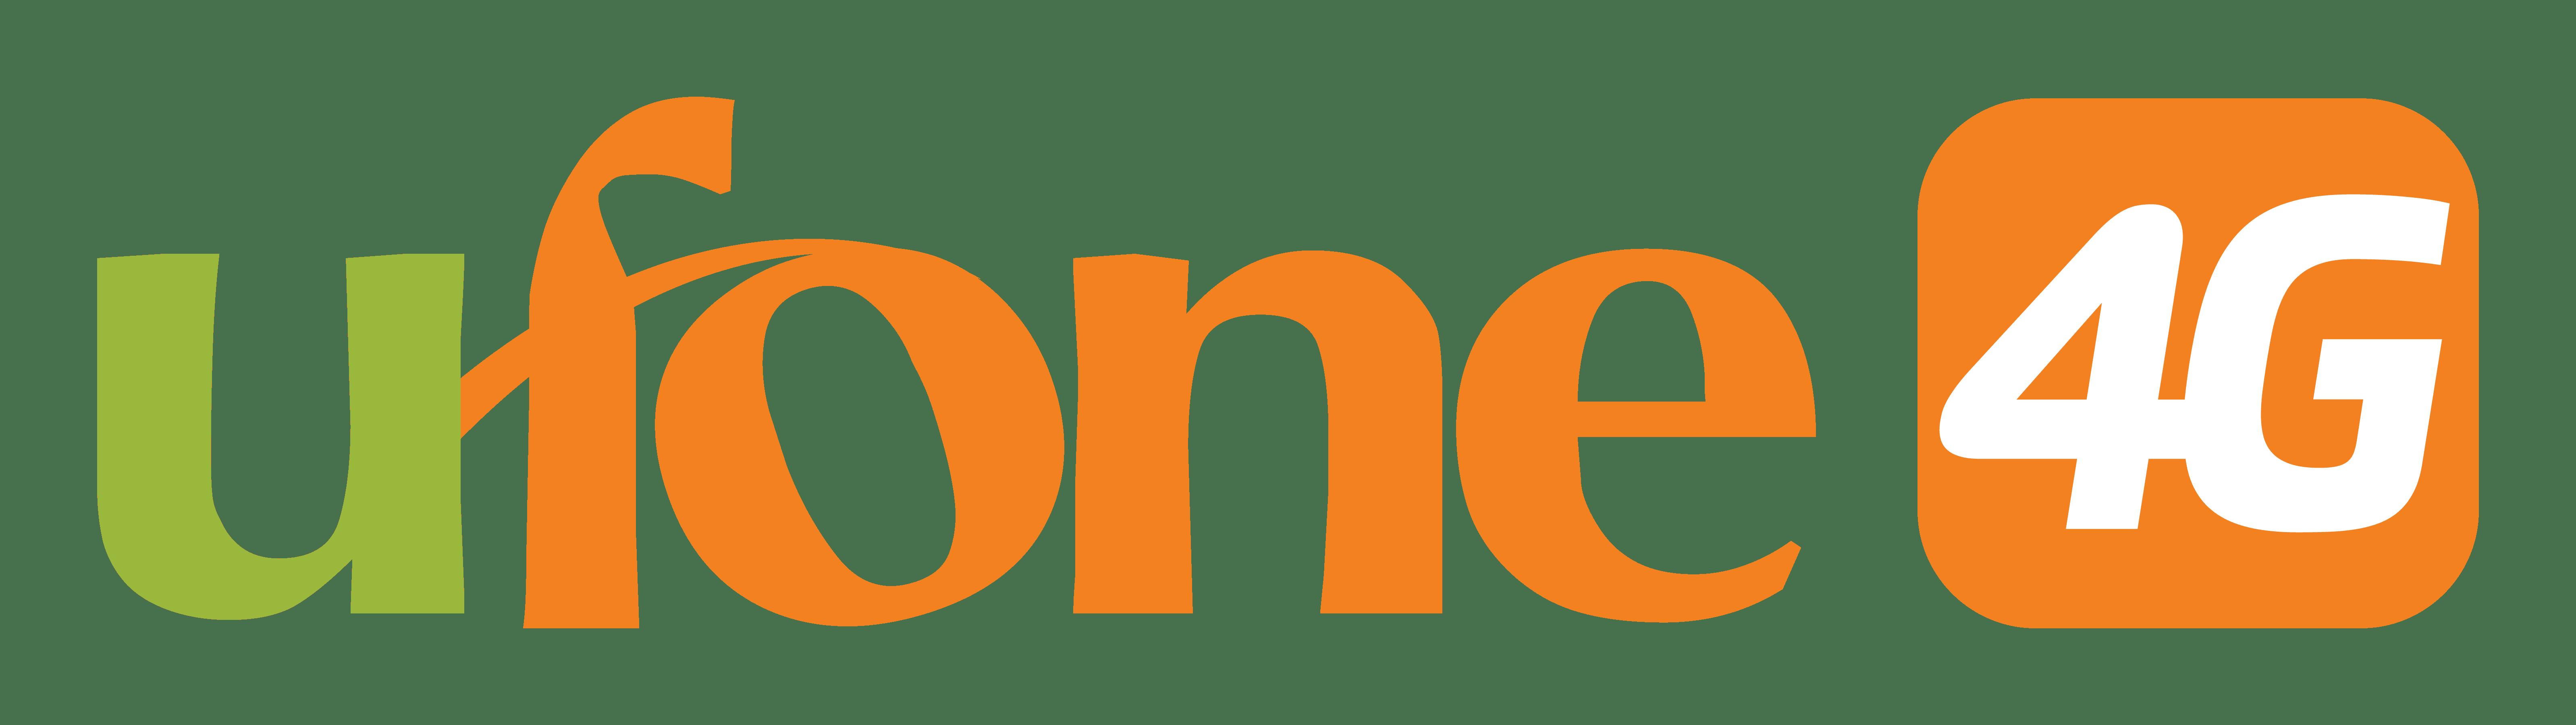 Ufone 4G logo - Ufone awarded 4G spectrum license